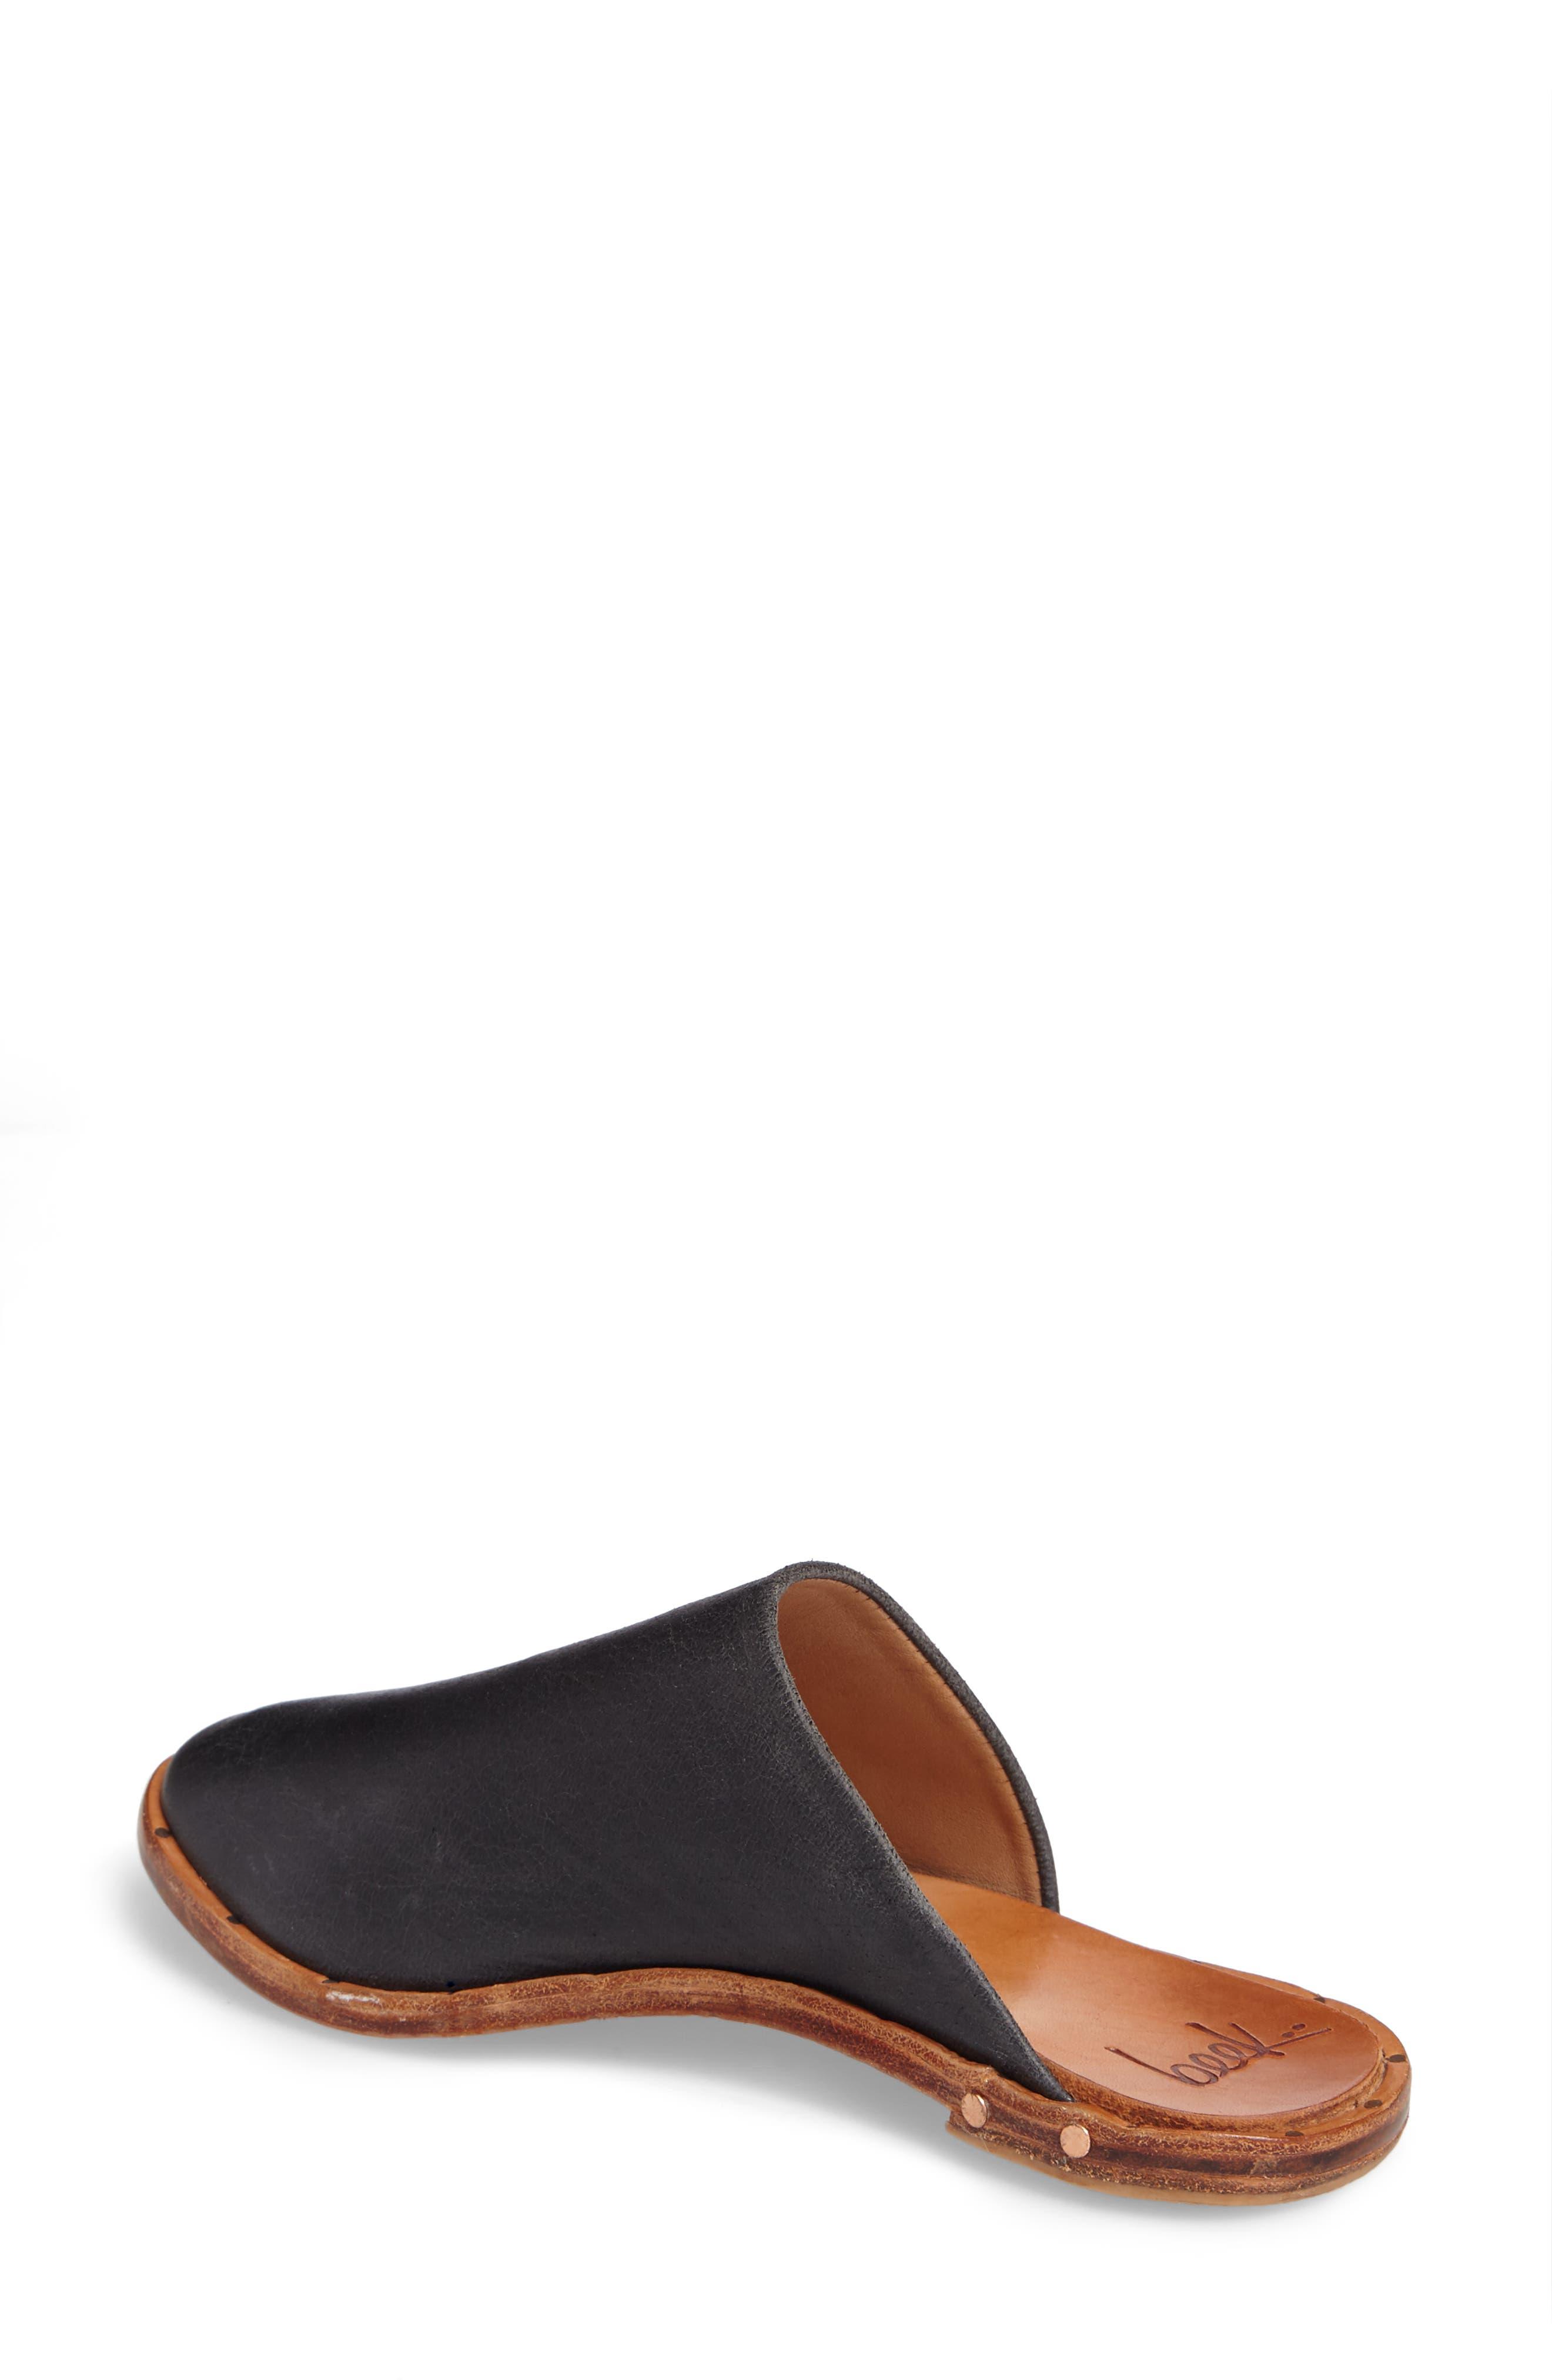 Seagull Mule,                             Alternate thumbnail 2, color,                             Vintage Black Leather